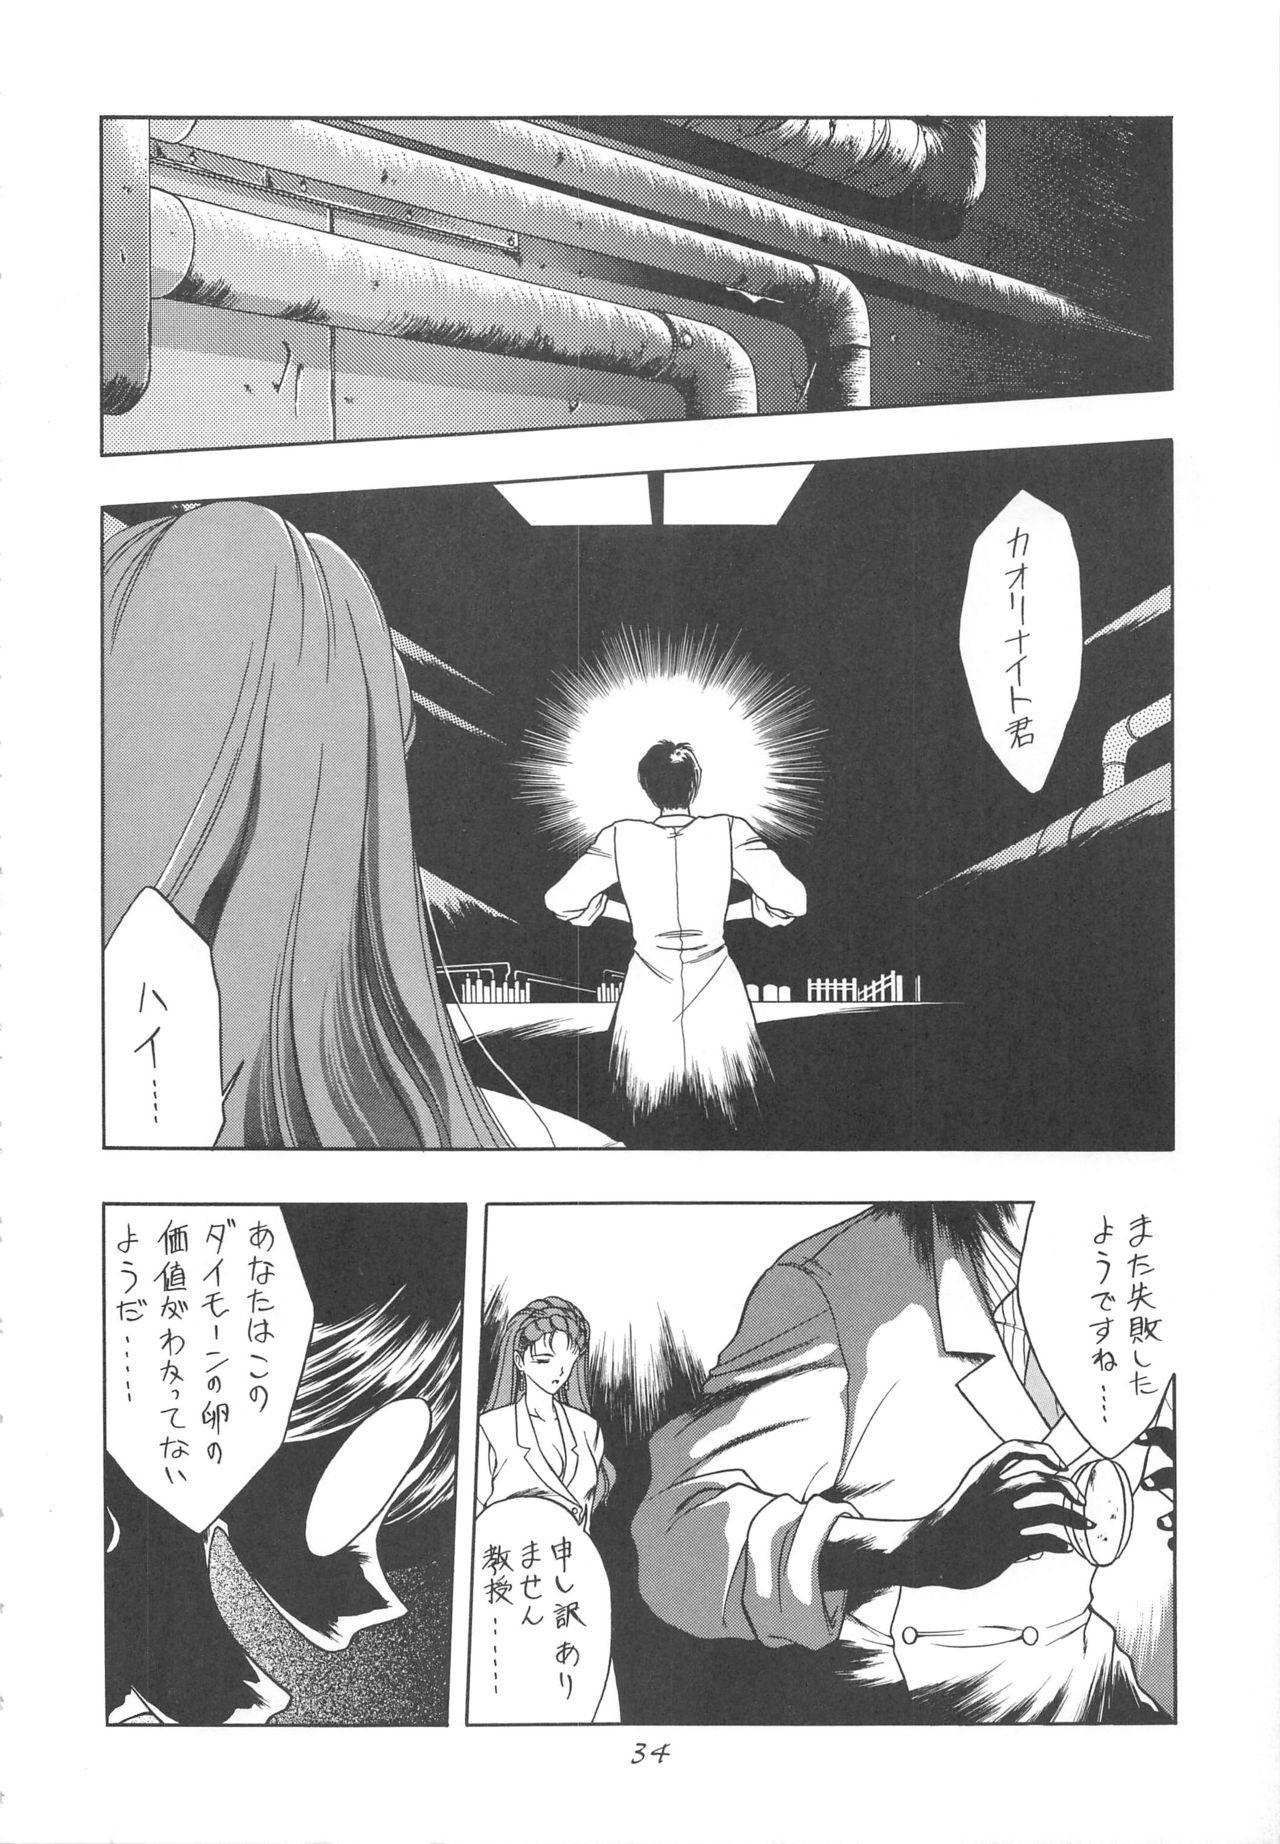 INDIVIDUAL 3 - 19930816 → 33